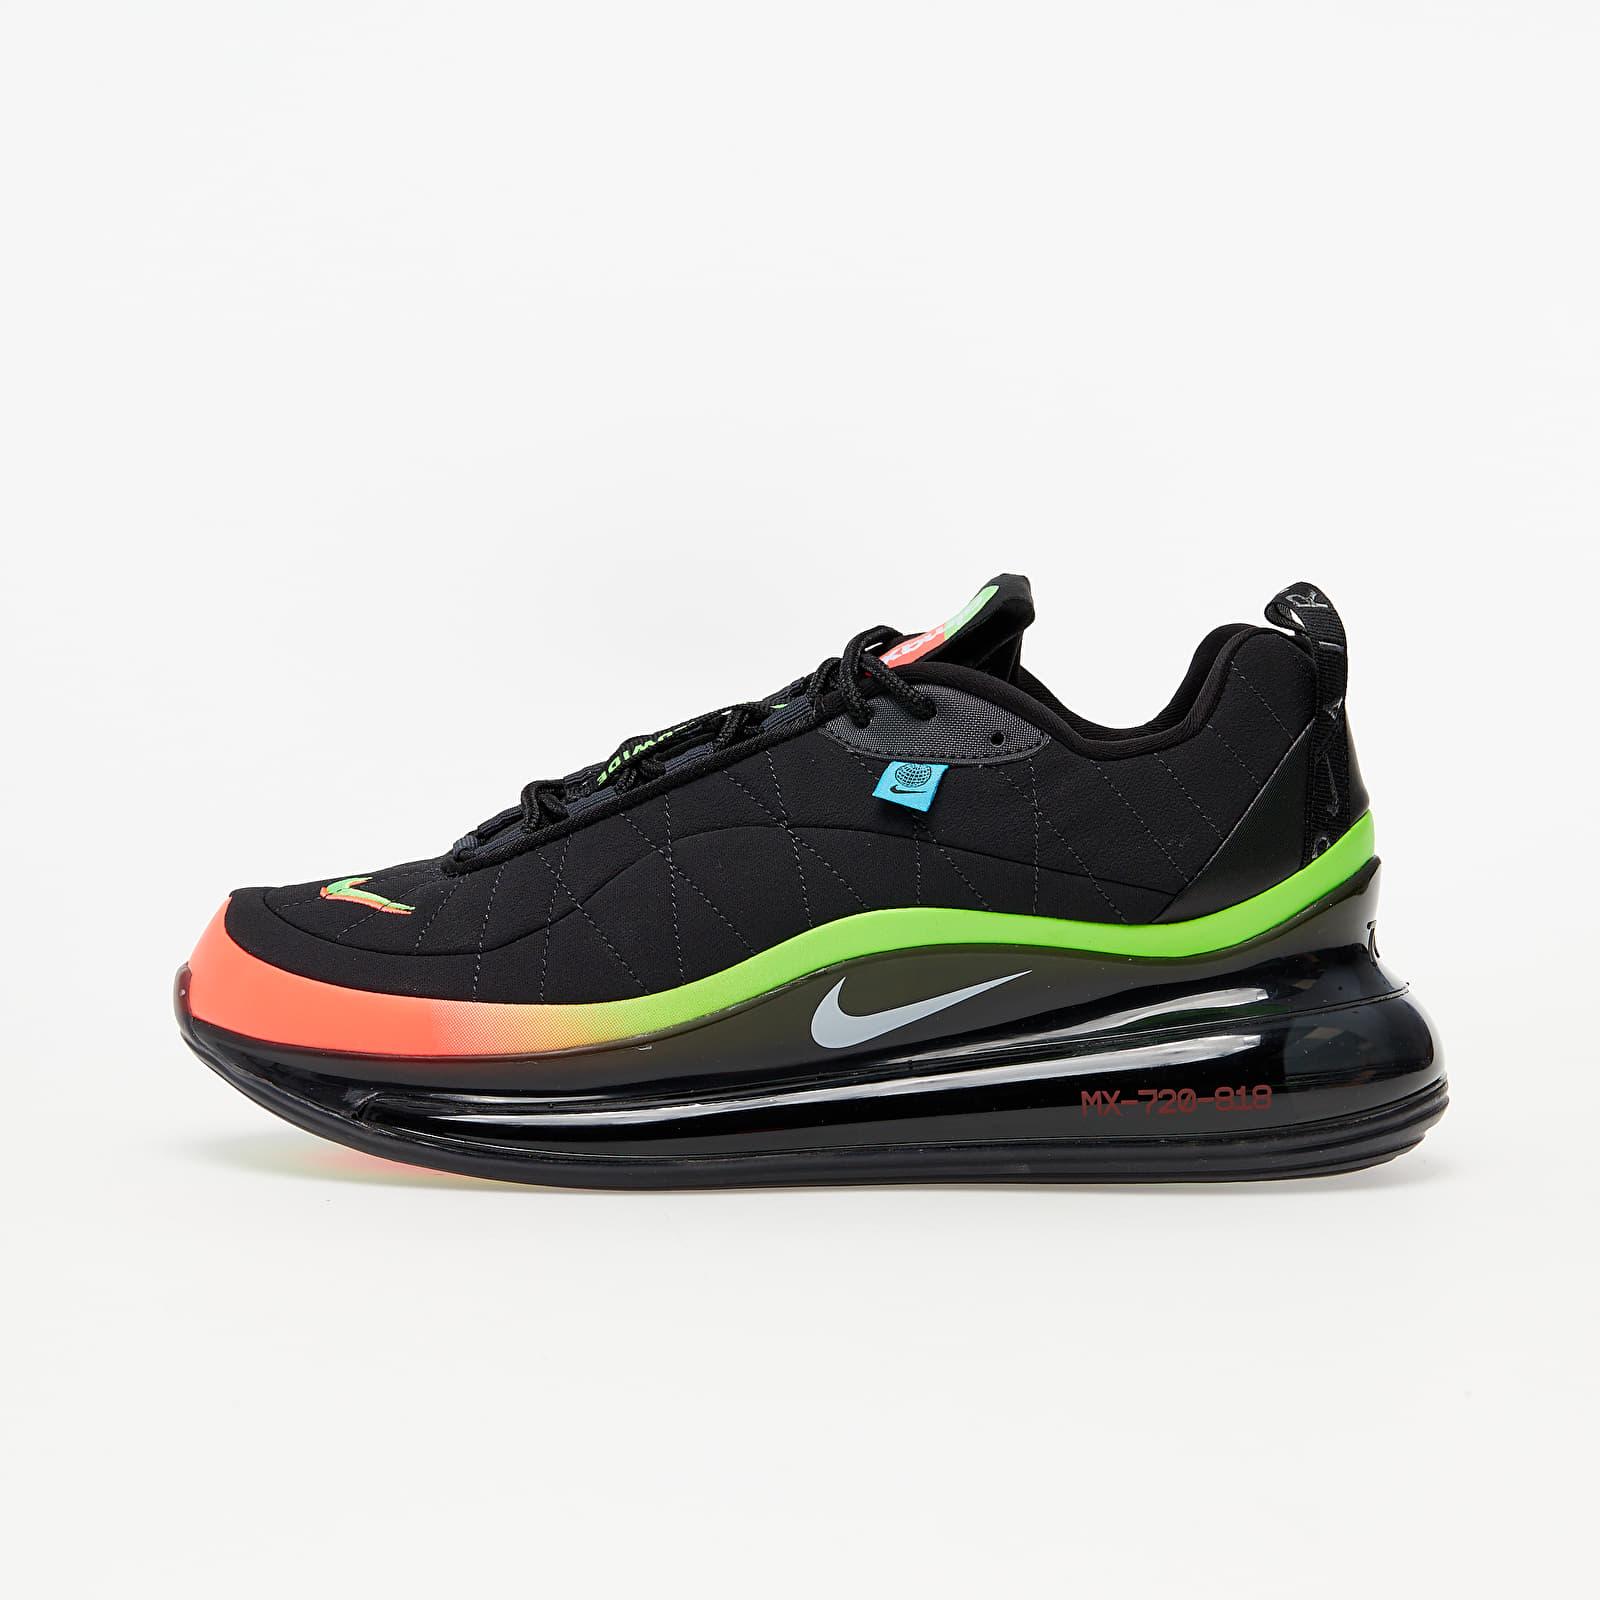 Zapatillas Hombre Nike MX-720-818 WW Black/ White-Green Strike-Flash Crimson